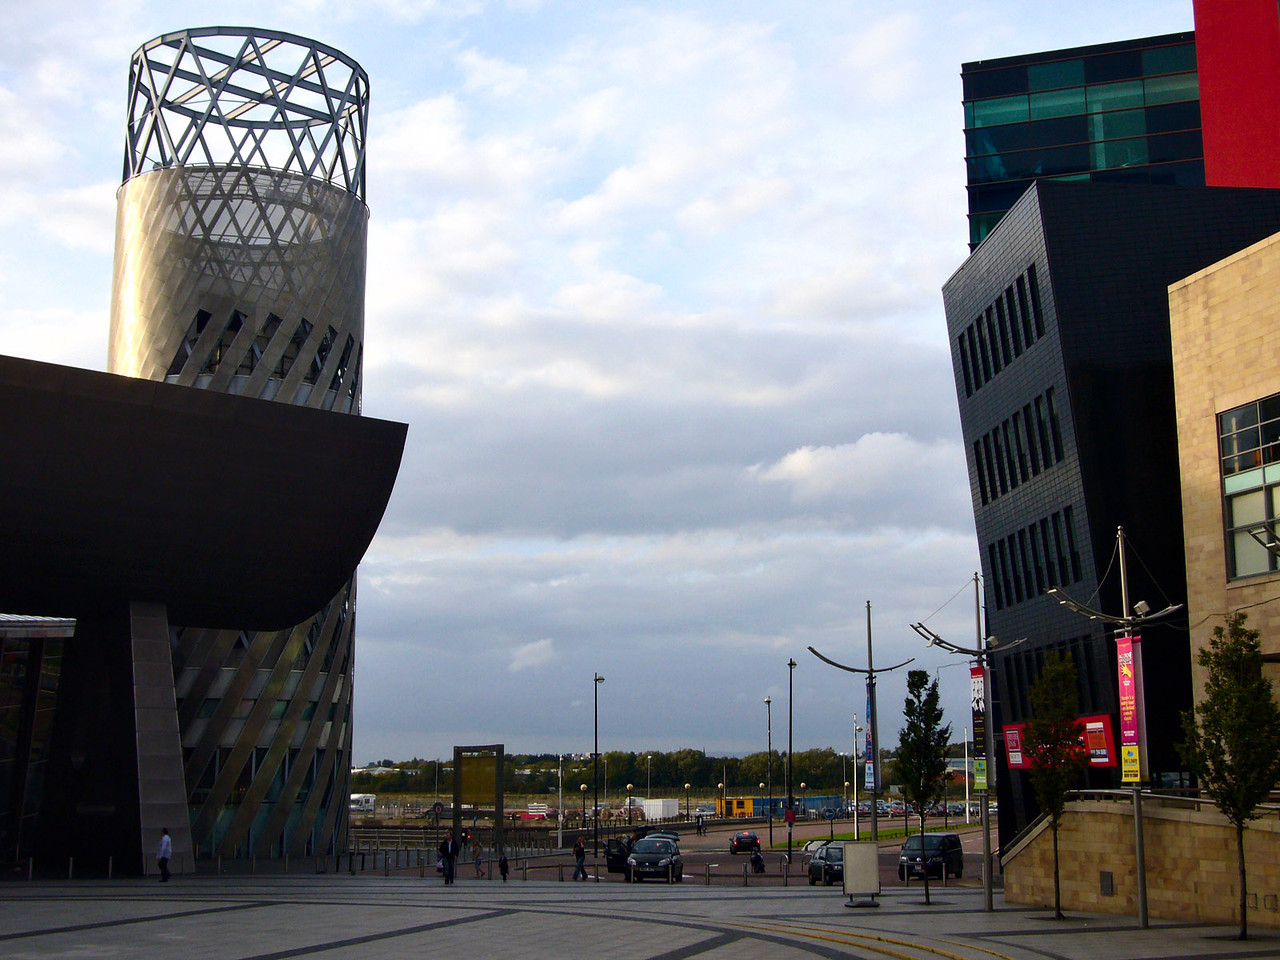 Plaza next to Lowry Centre